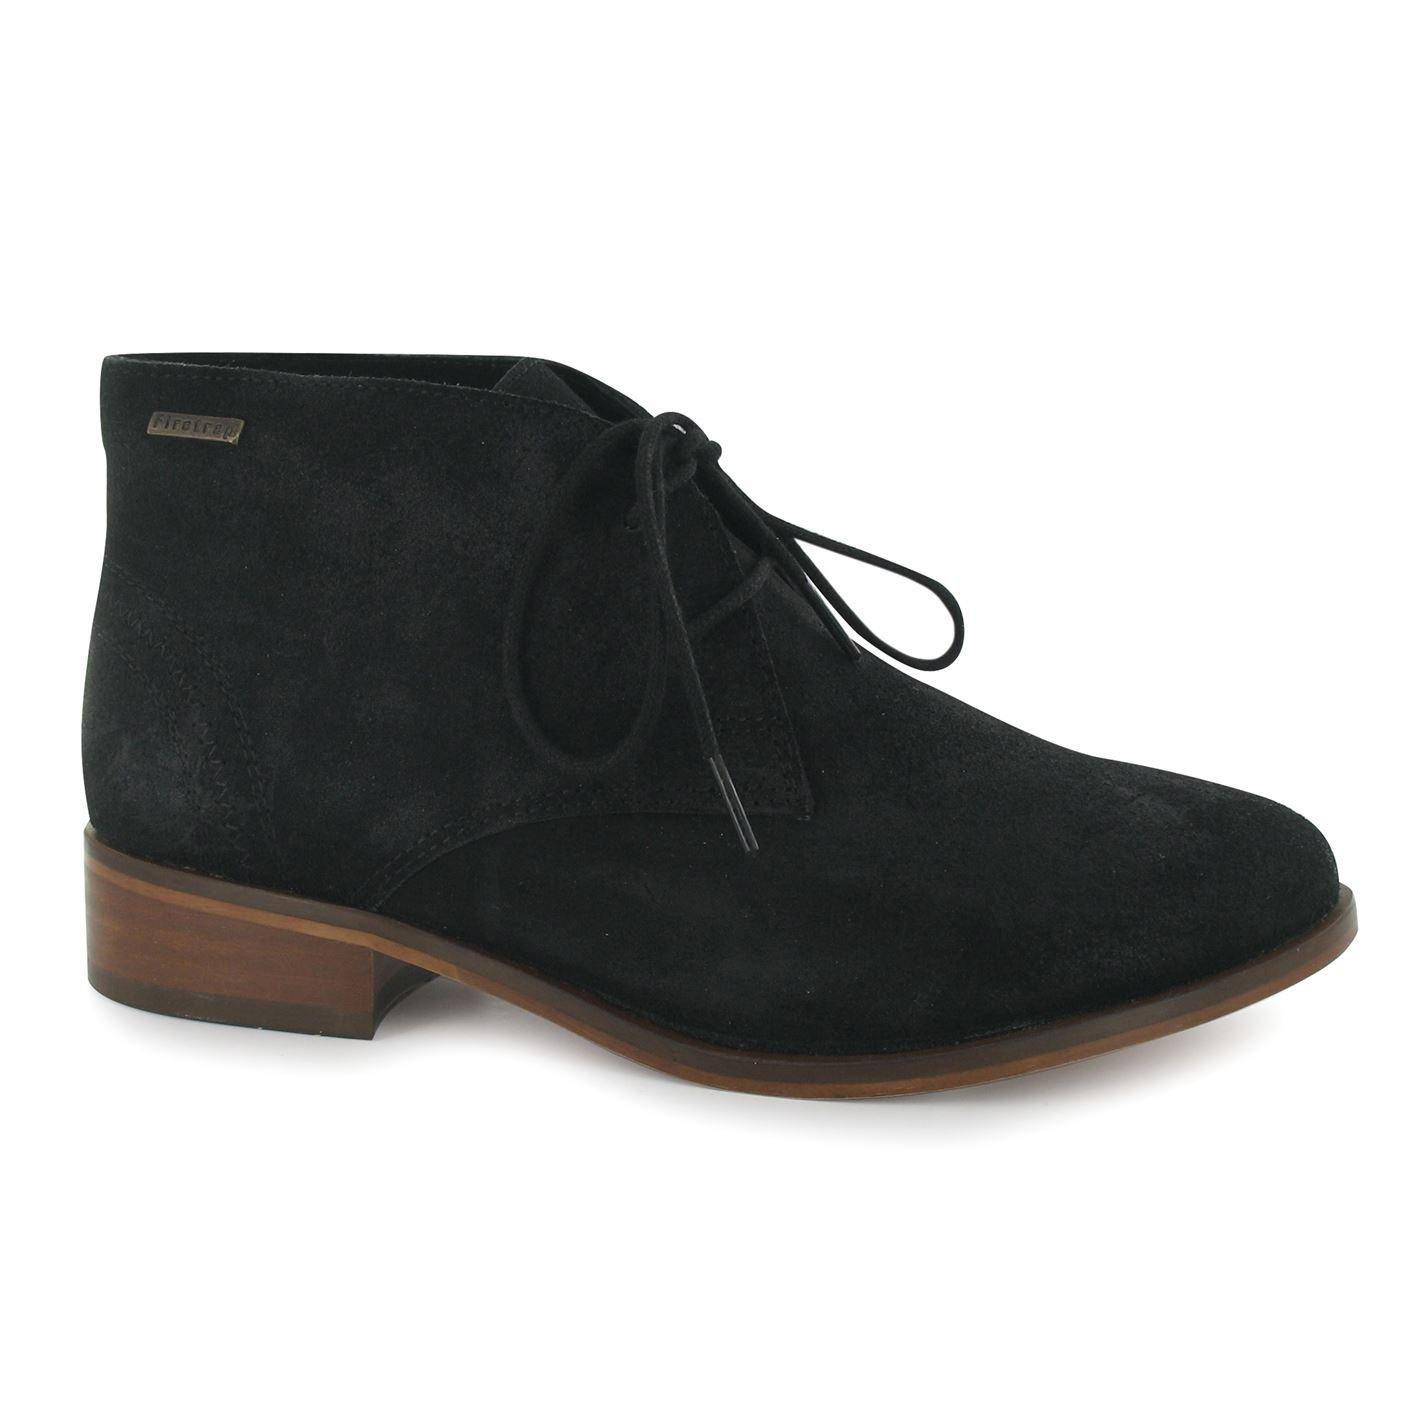 Firetrap Womens Ladies Sinita Boots Slight Heel Flat Ankle Lace Up Footwear